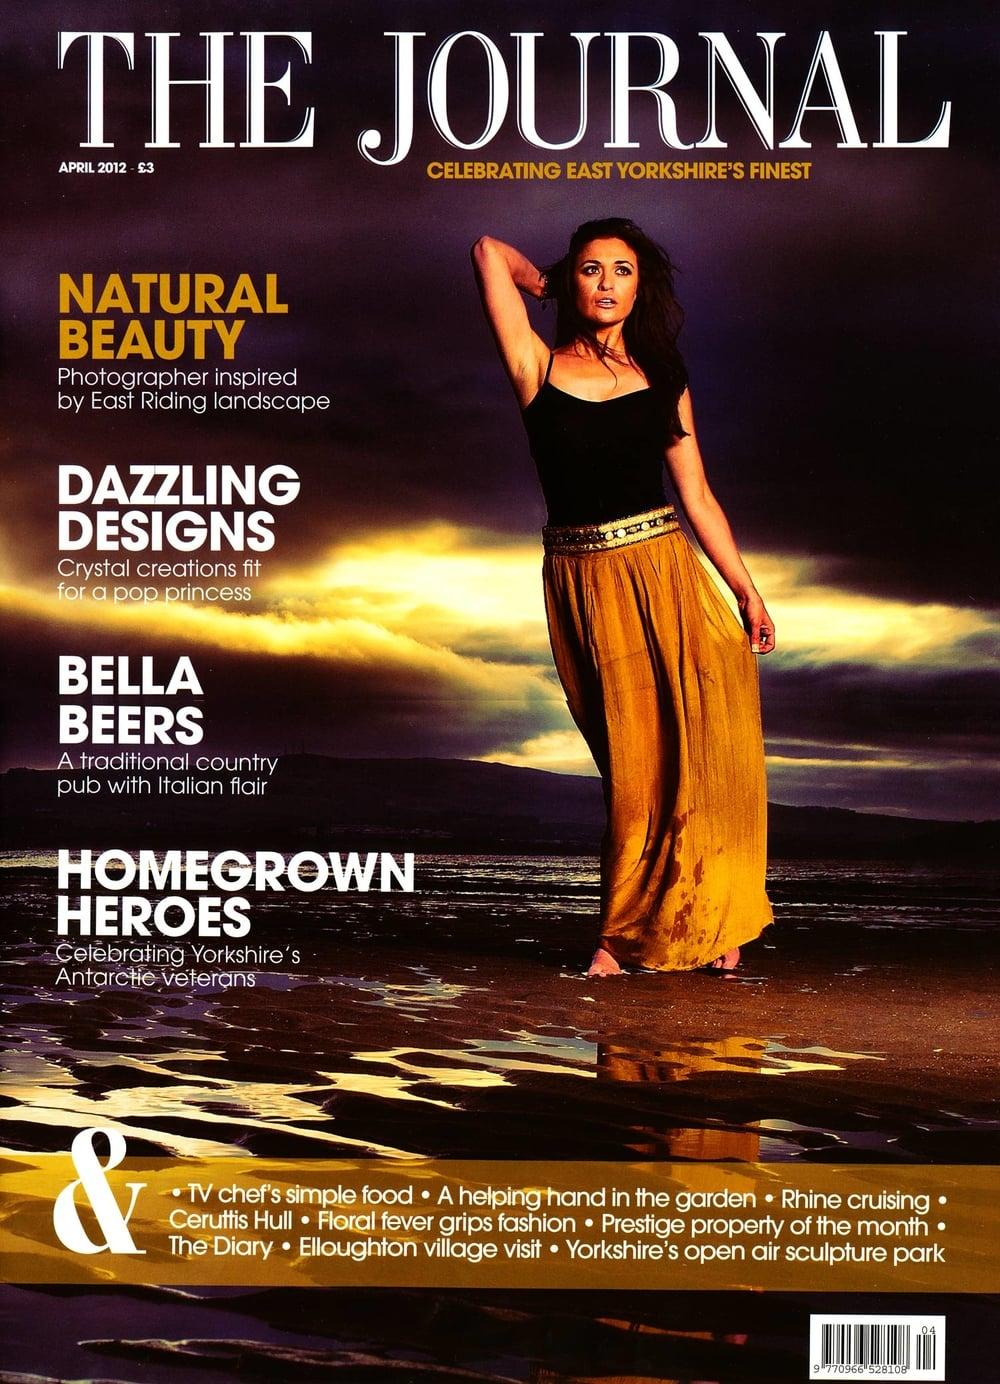 the_journal_cover.jpg